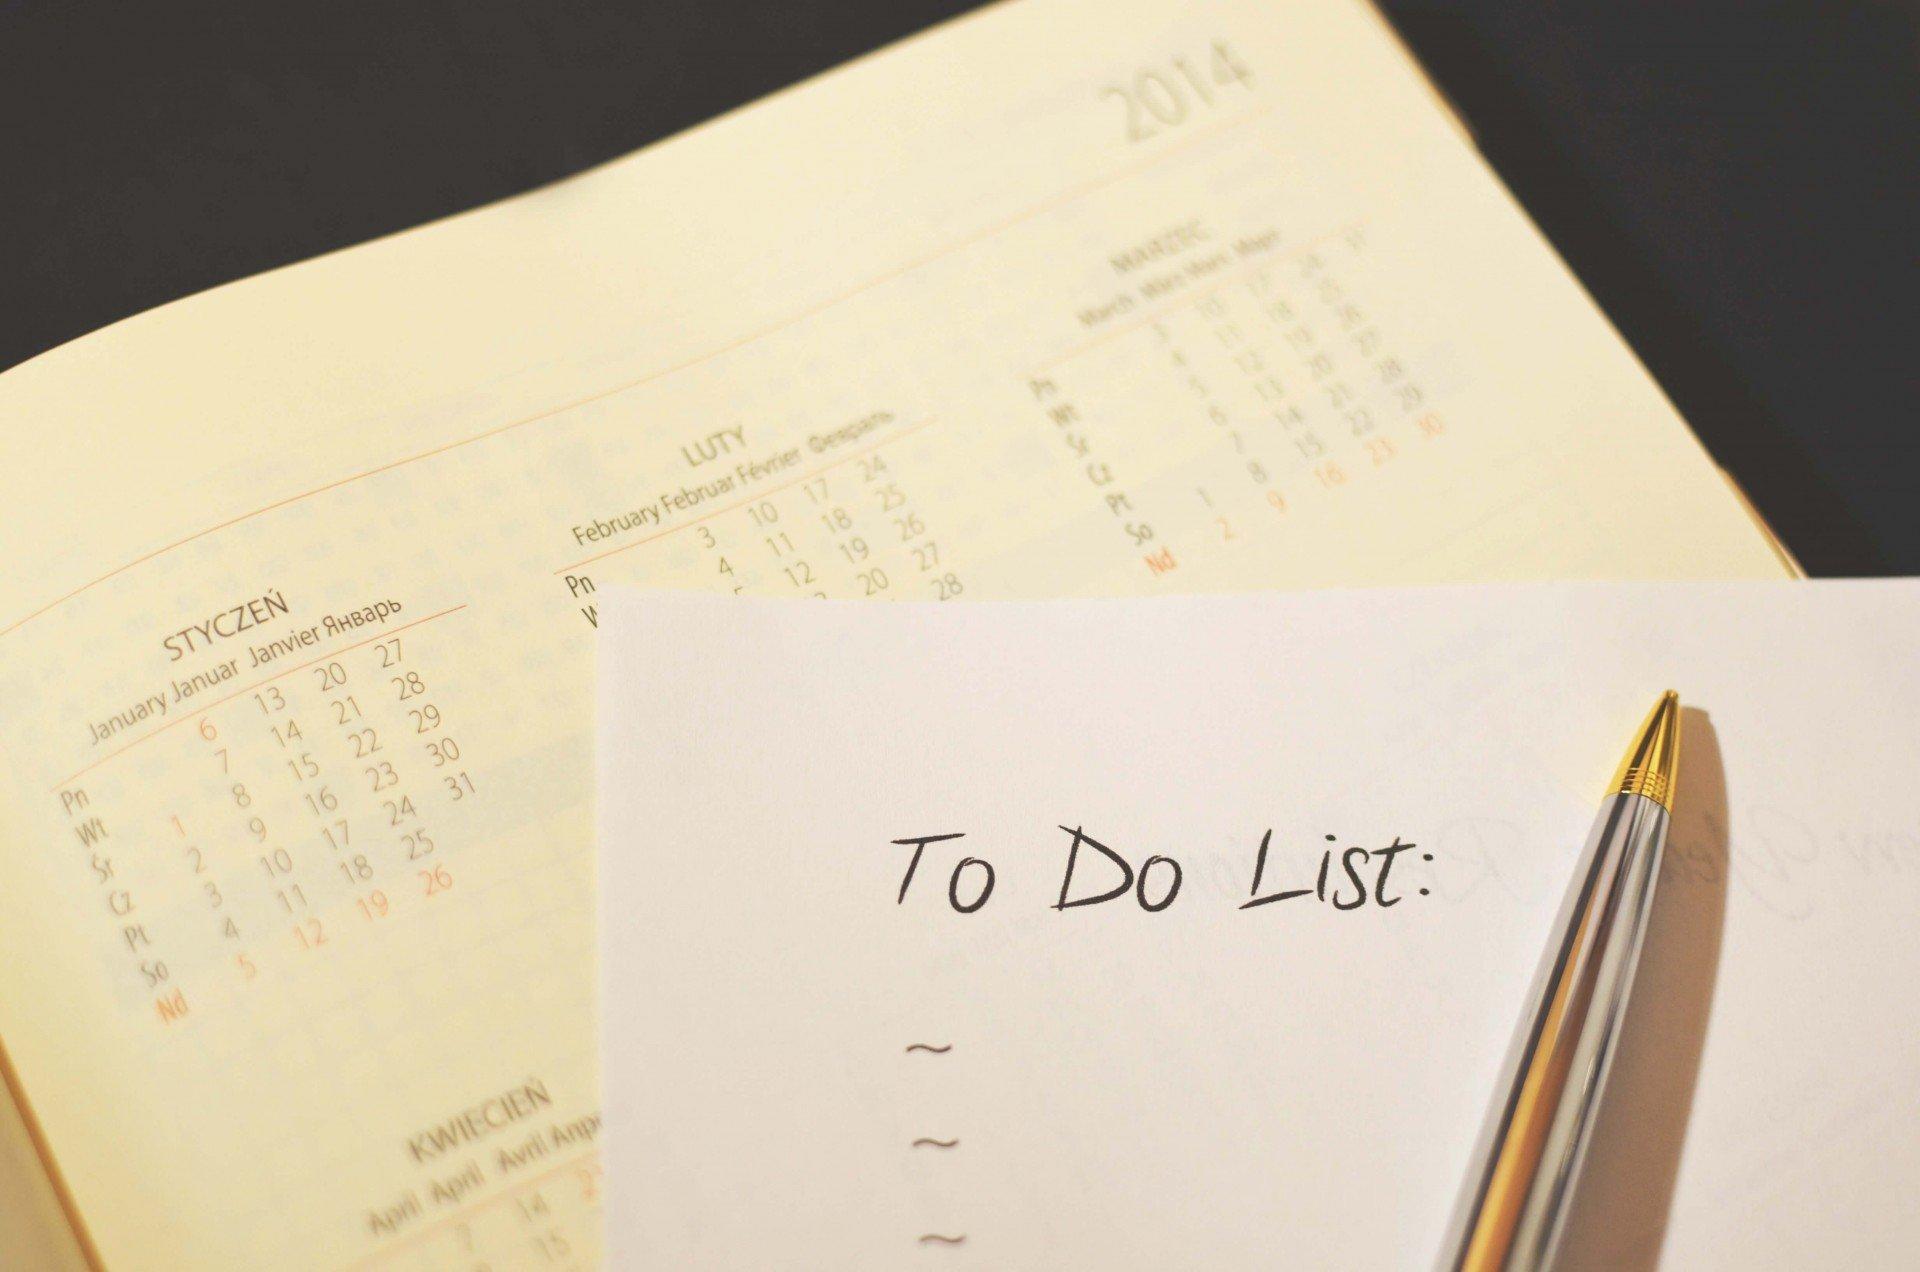 Agenda Calendar Checklist 3243 1 1920x1272